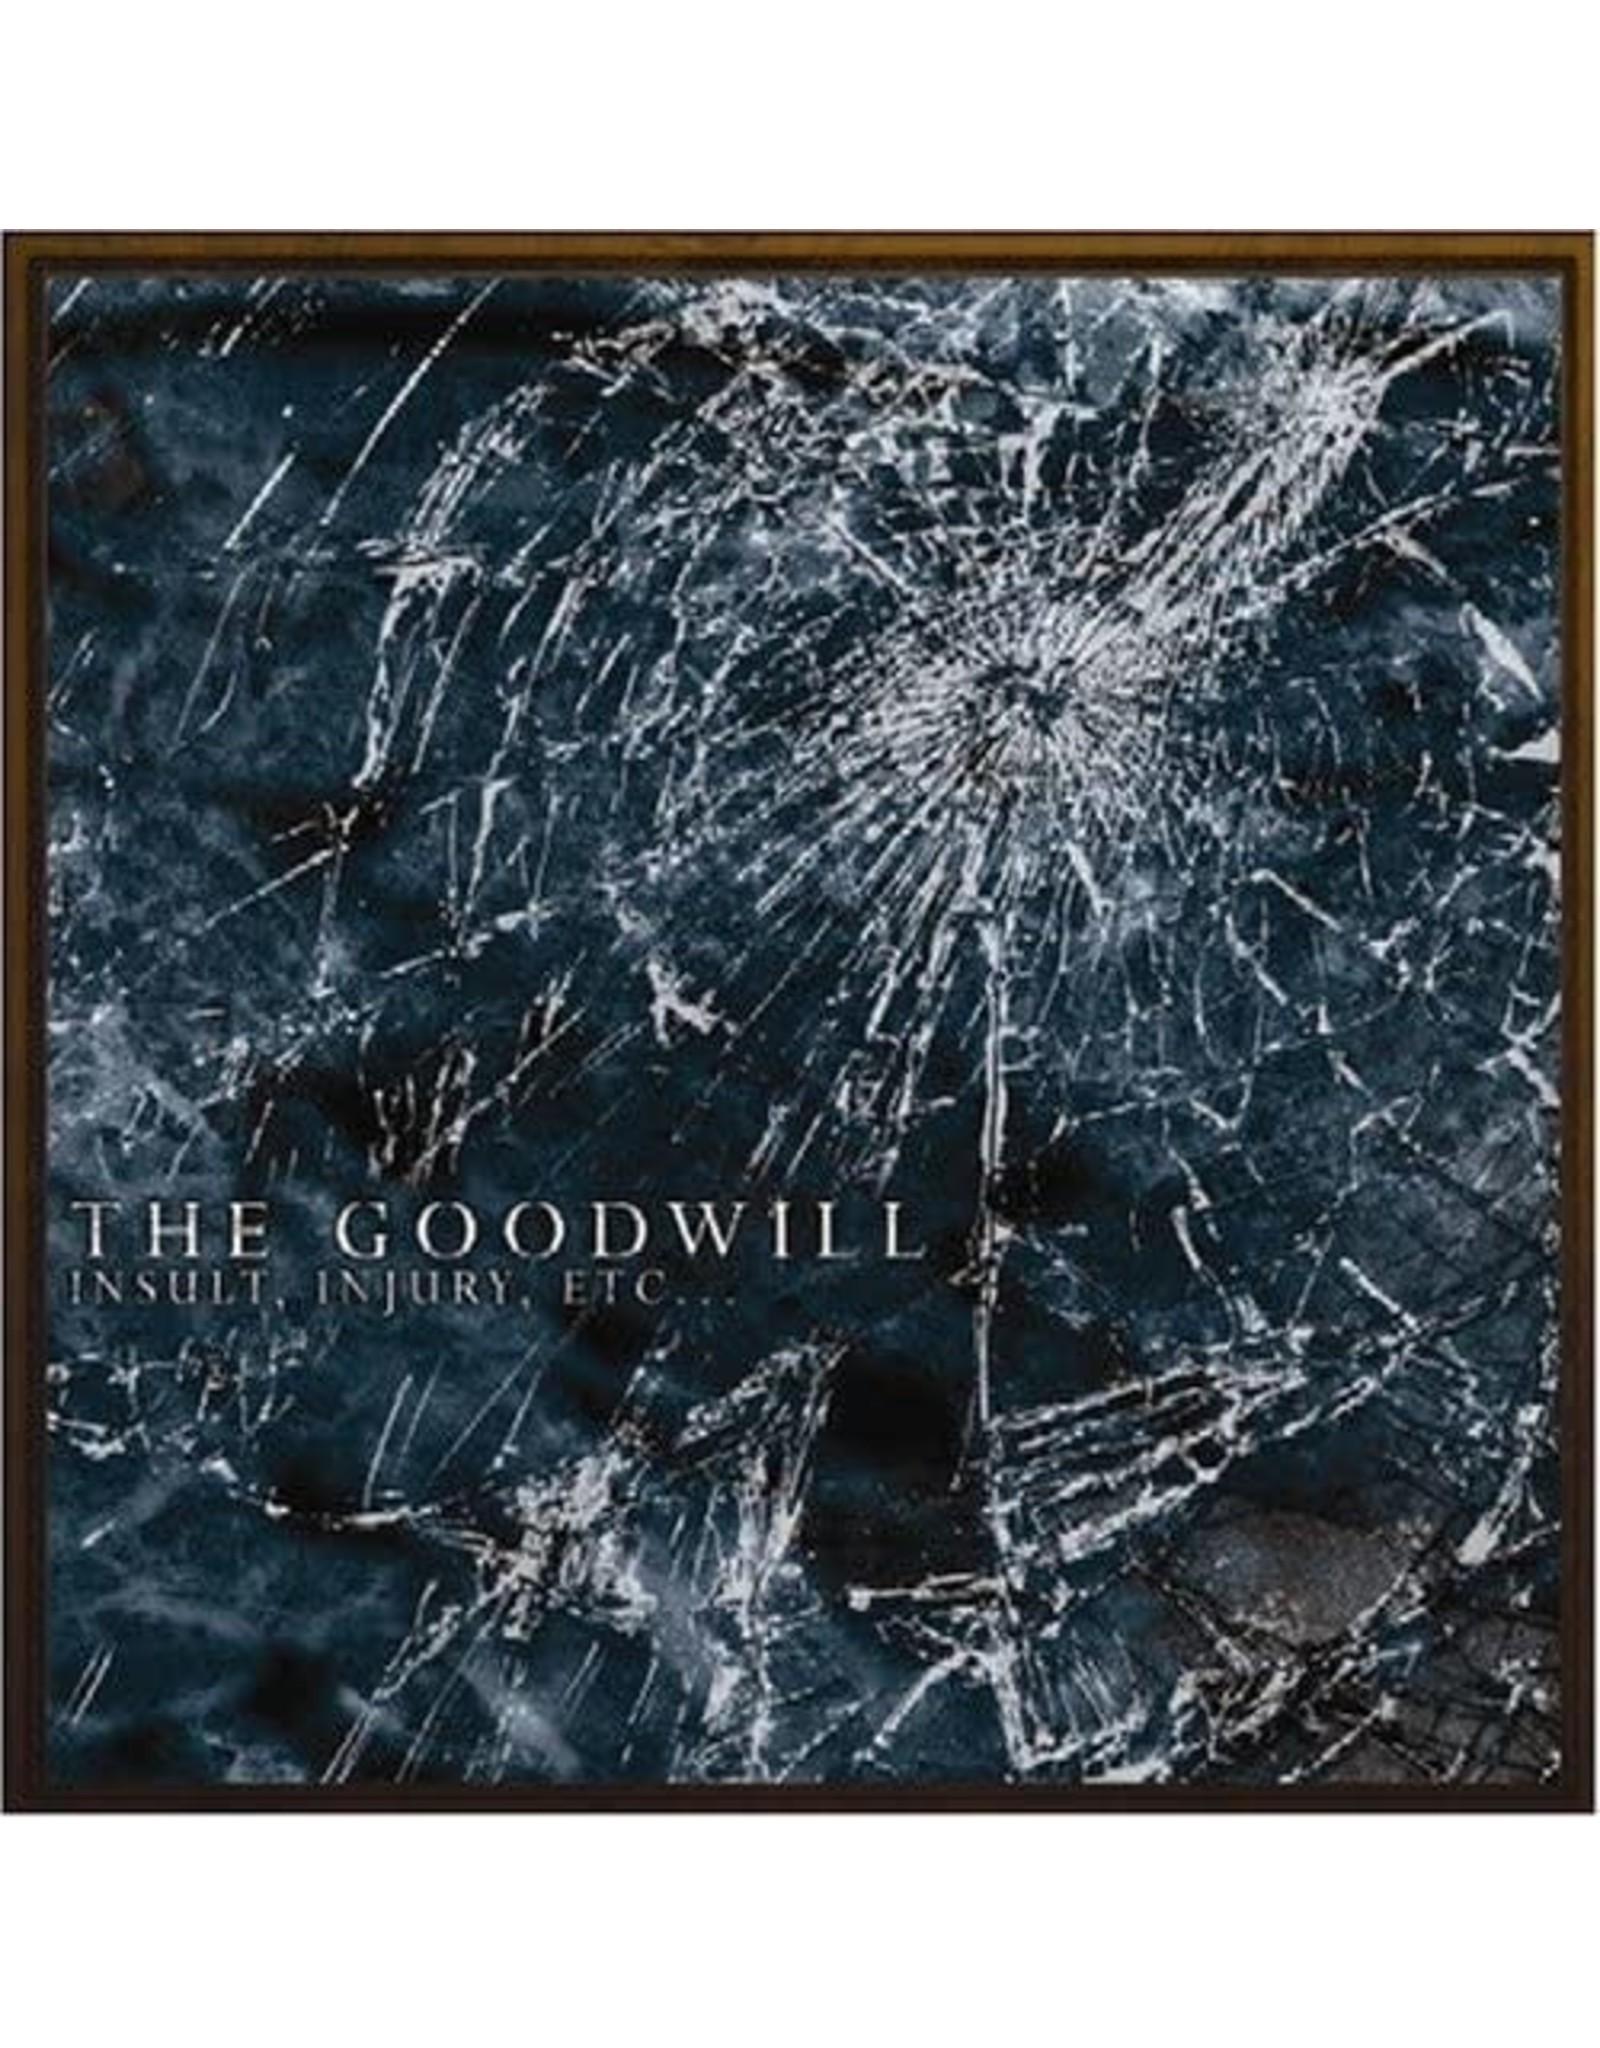 Goodwill - Insult, Injury, Etc... CD